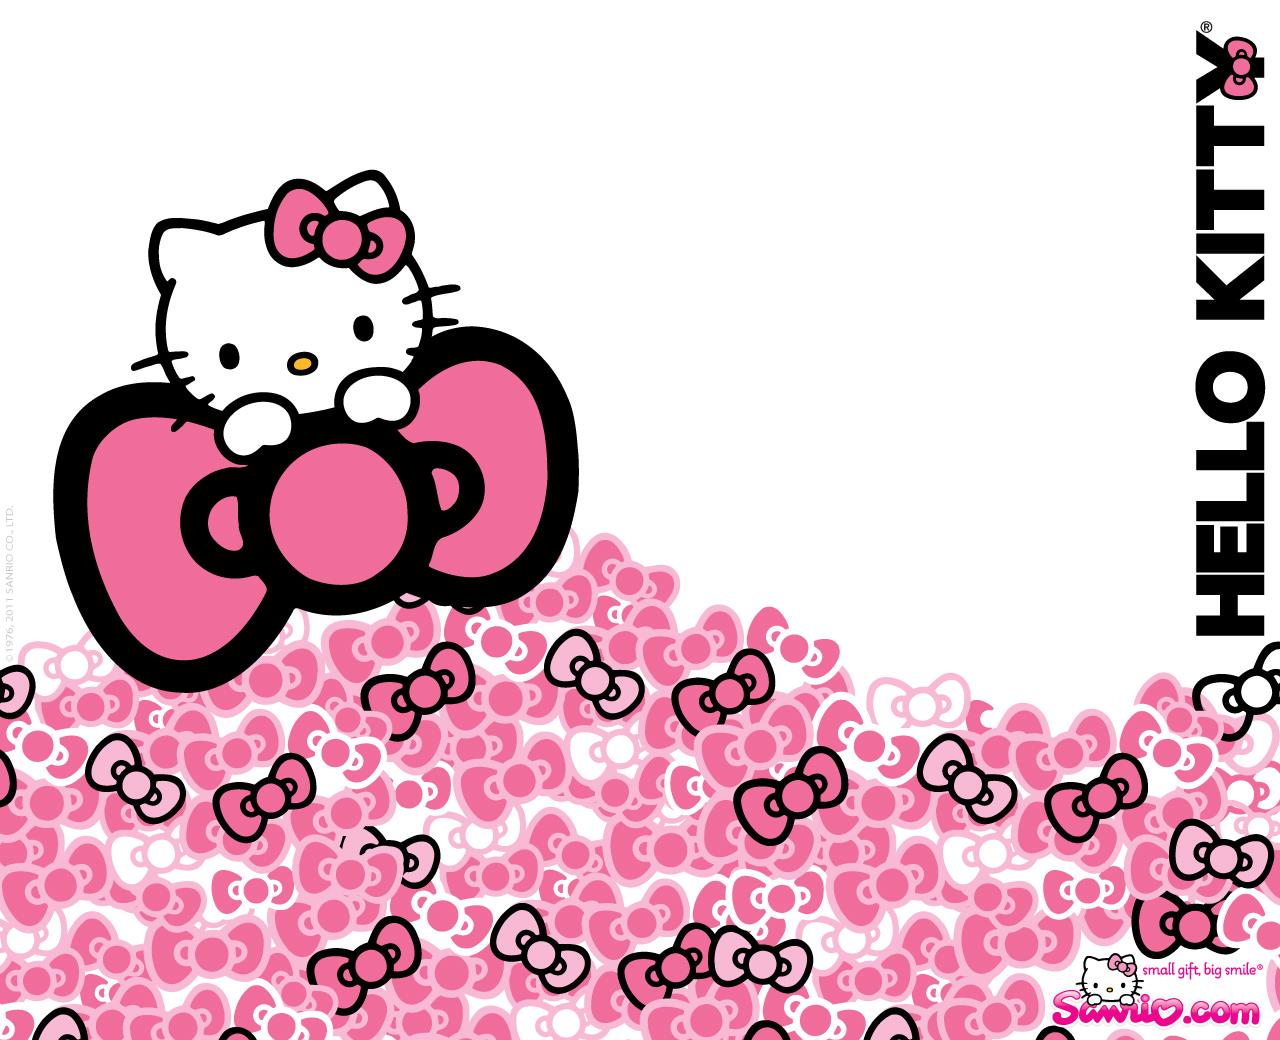 Namn:  Hello-kitty-Wallpapers-From-Sanrio-Website.jpg Visningar: 822 Storlek:  621.8 KB